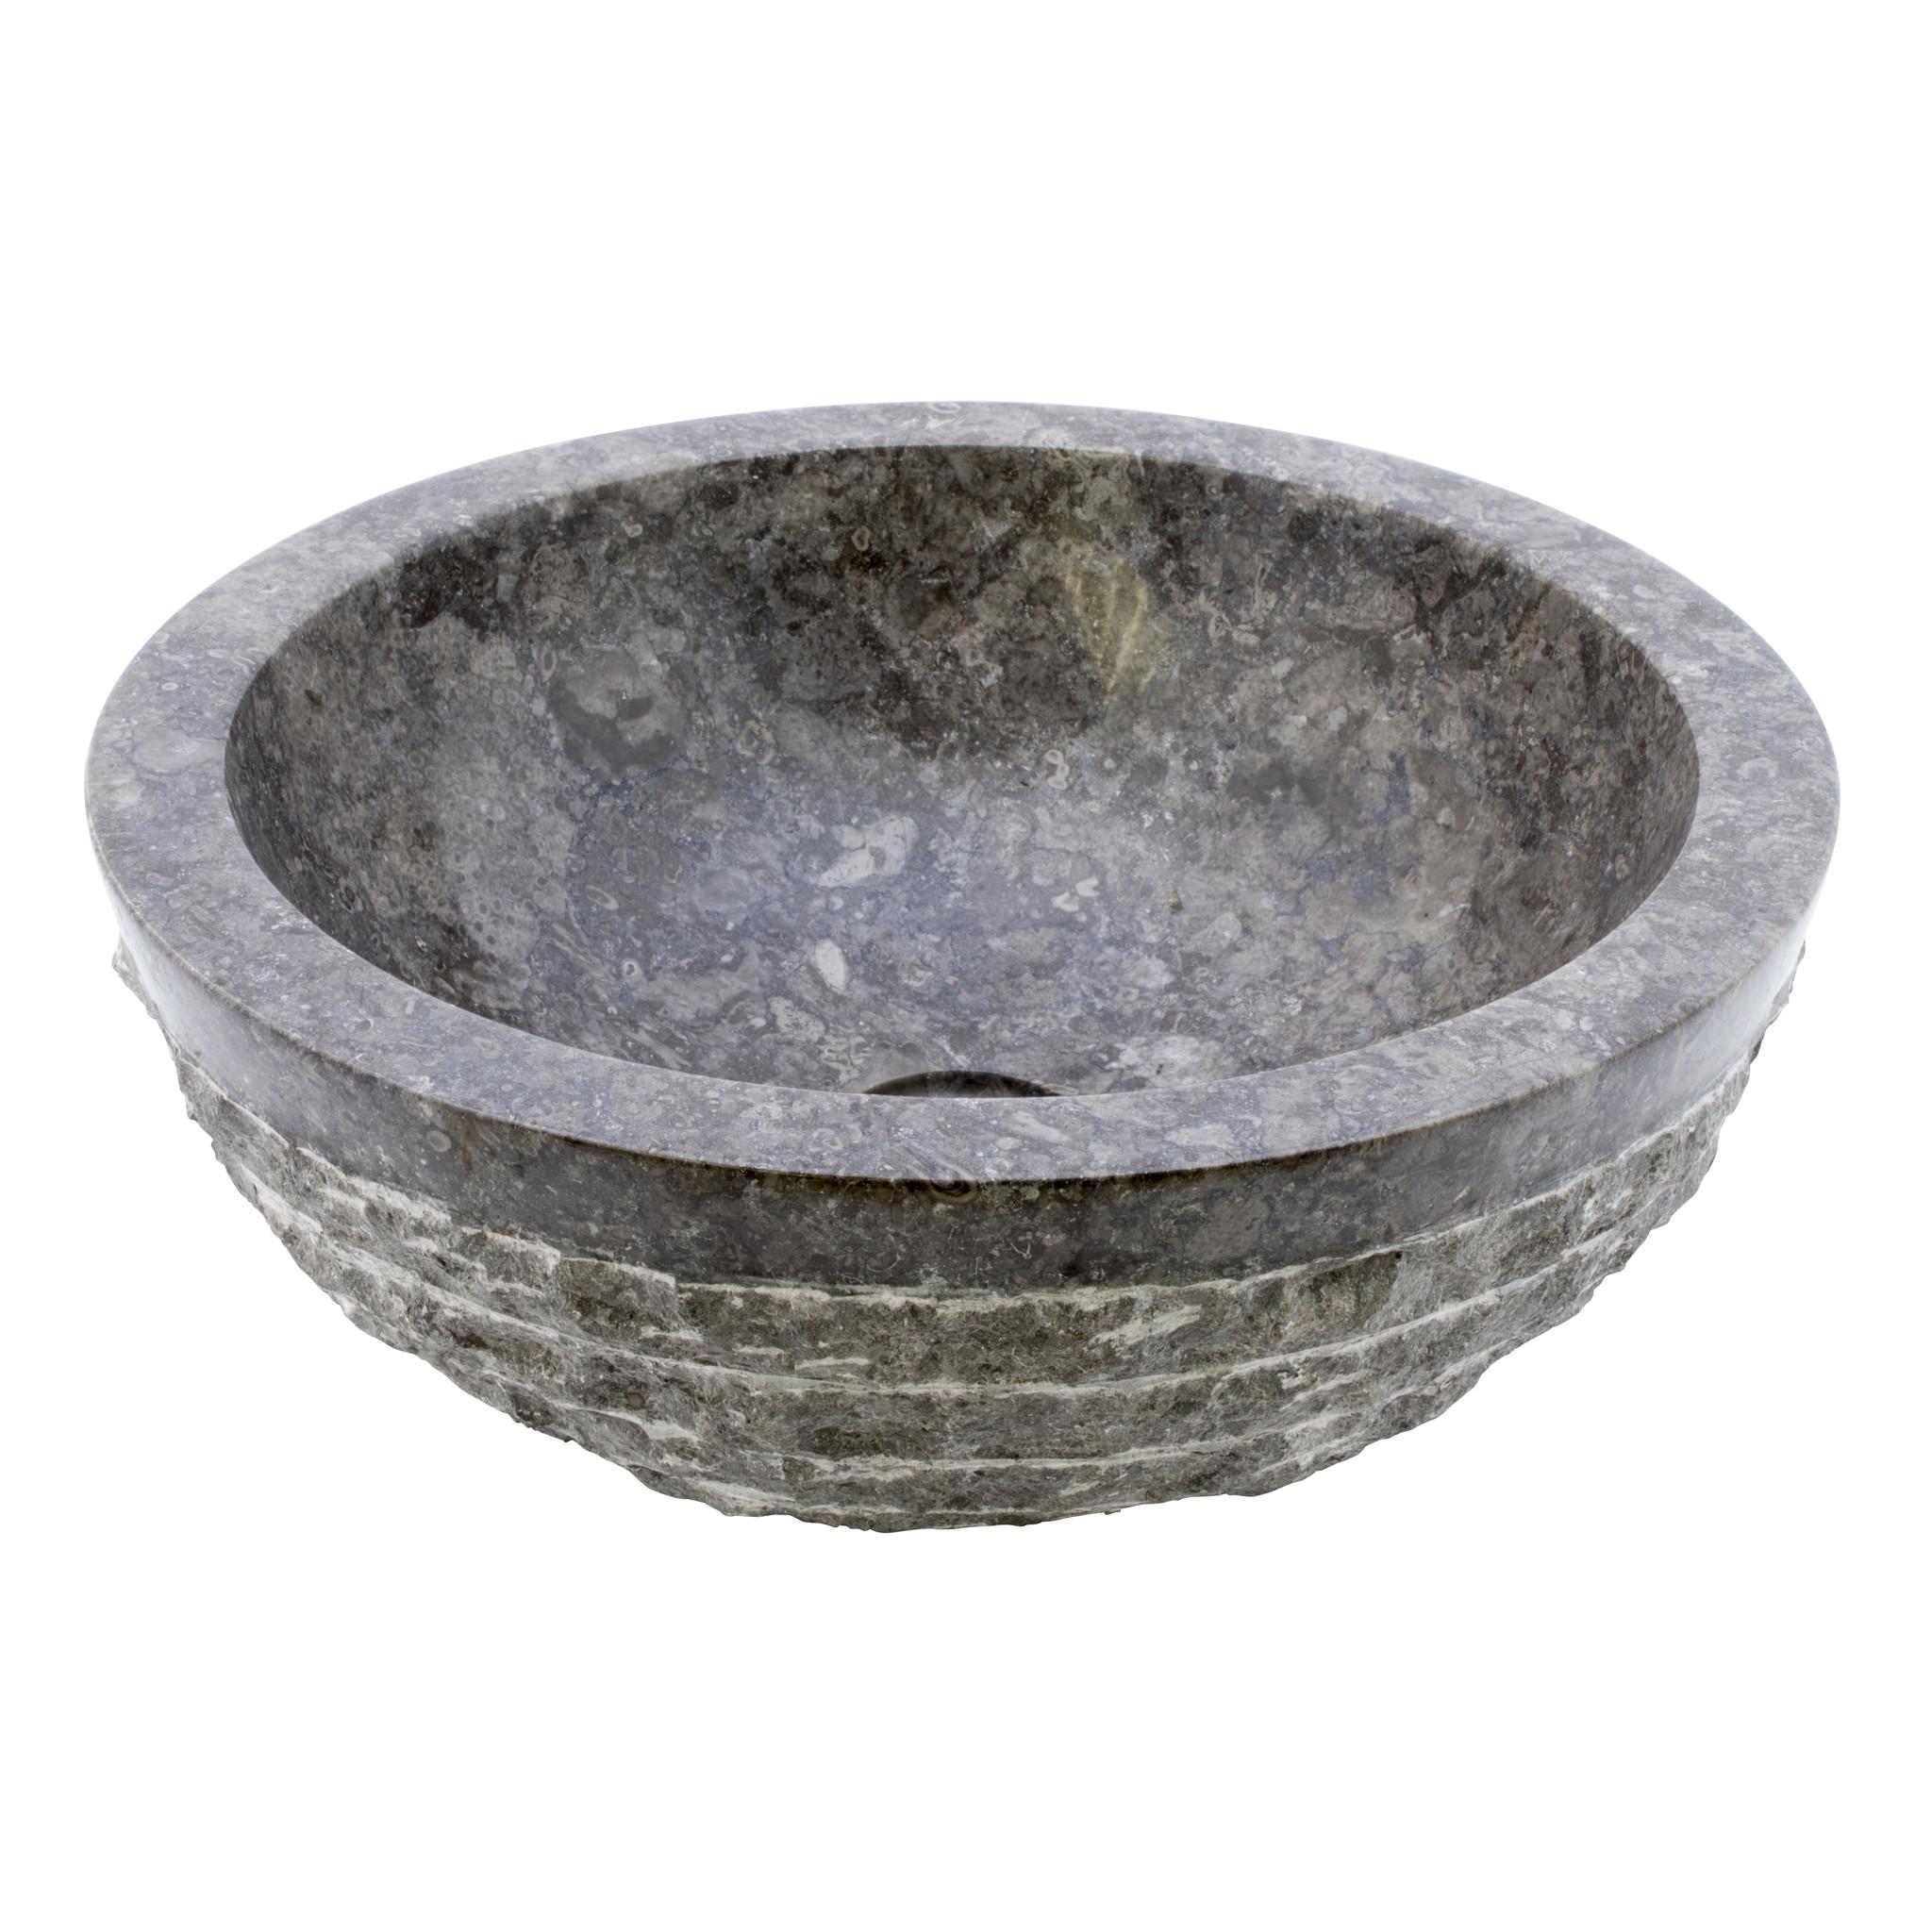 Indomarmer Grauem Marmor Waschbecken Marmo-Polish  Ø 40 x H 15 cm